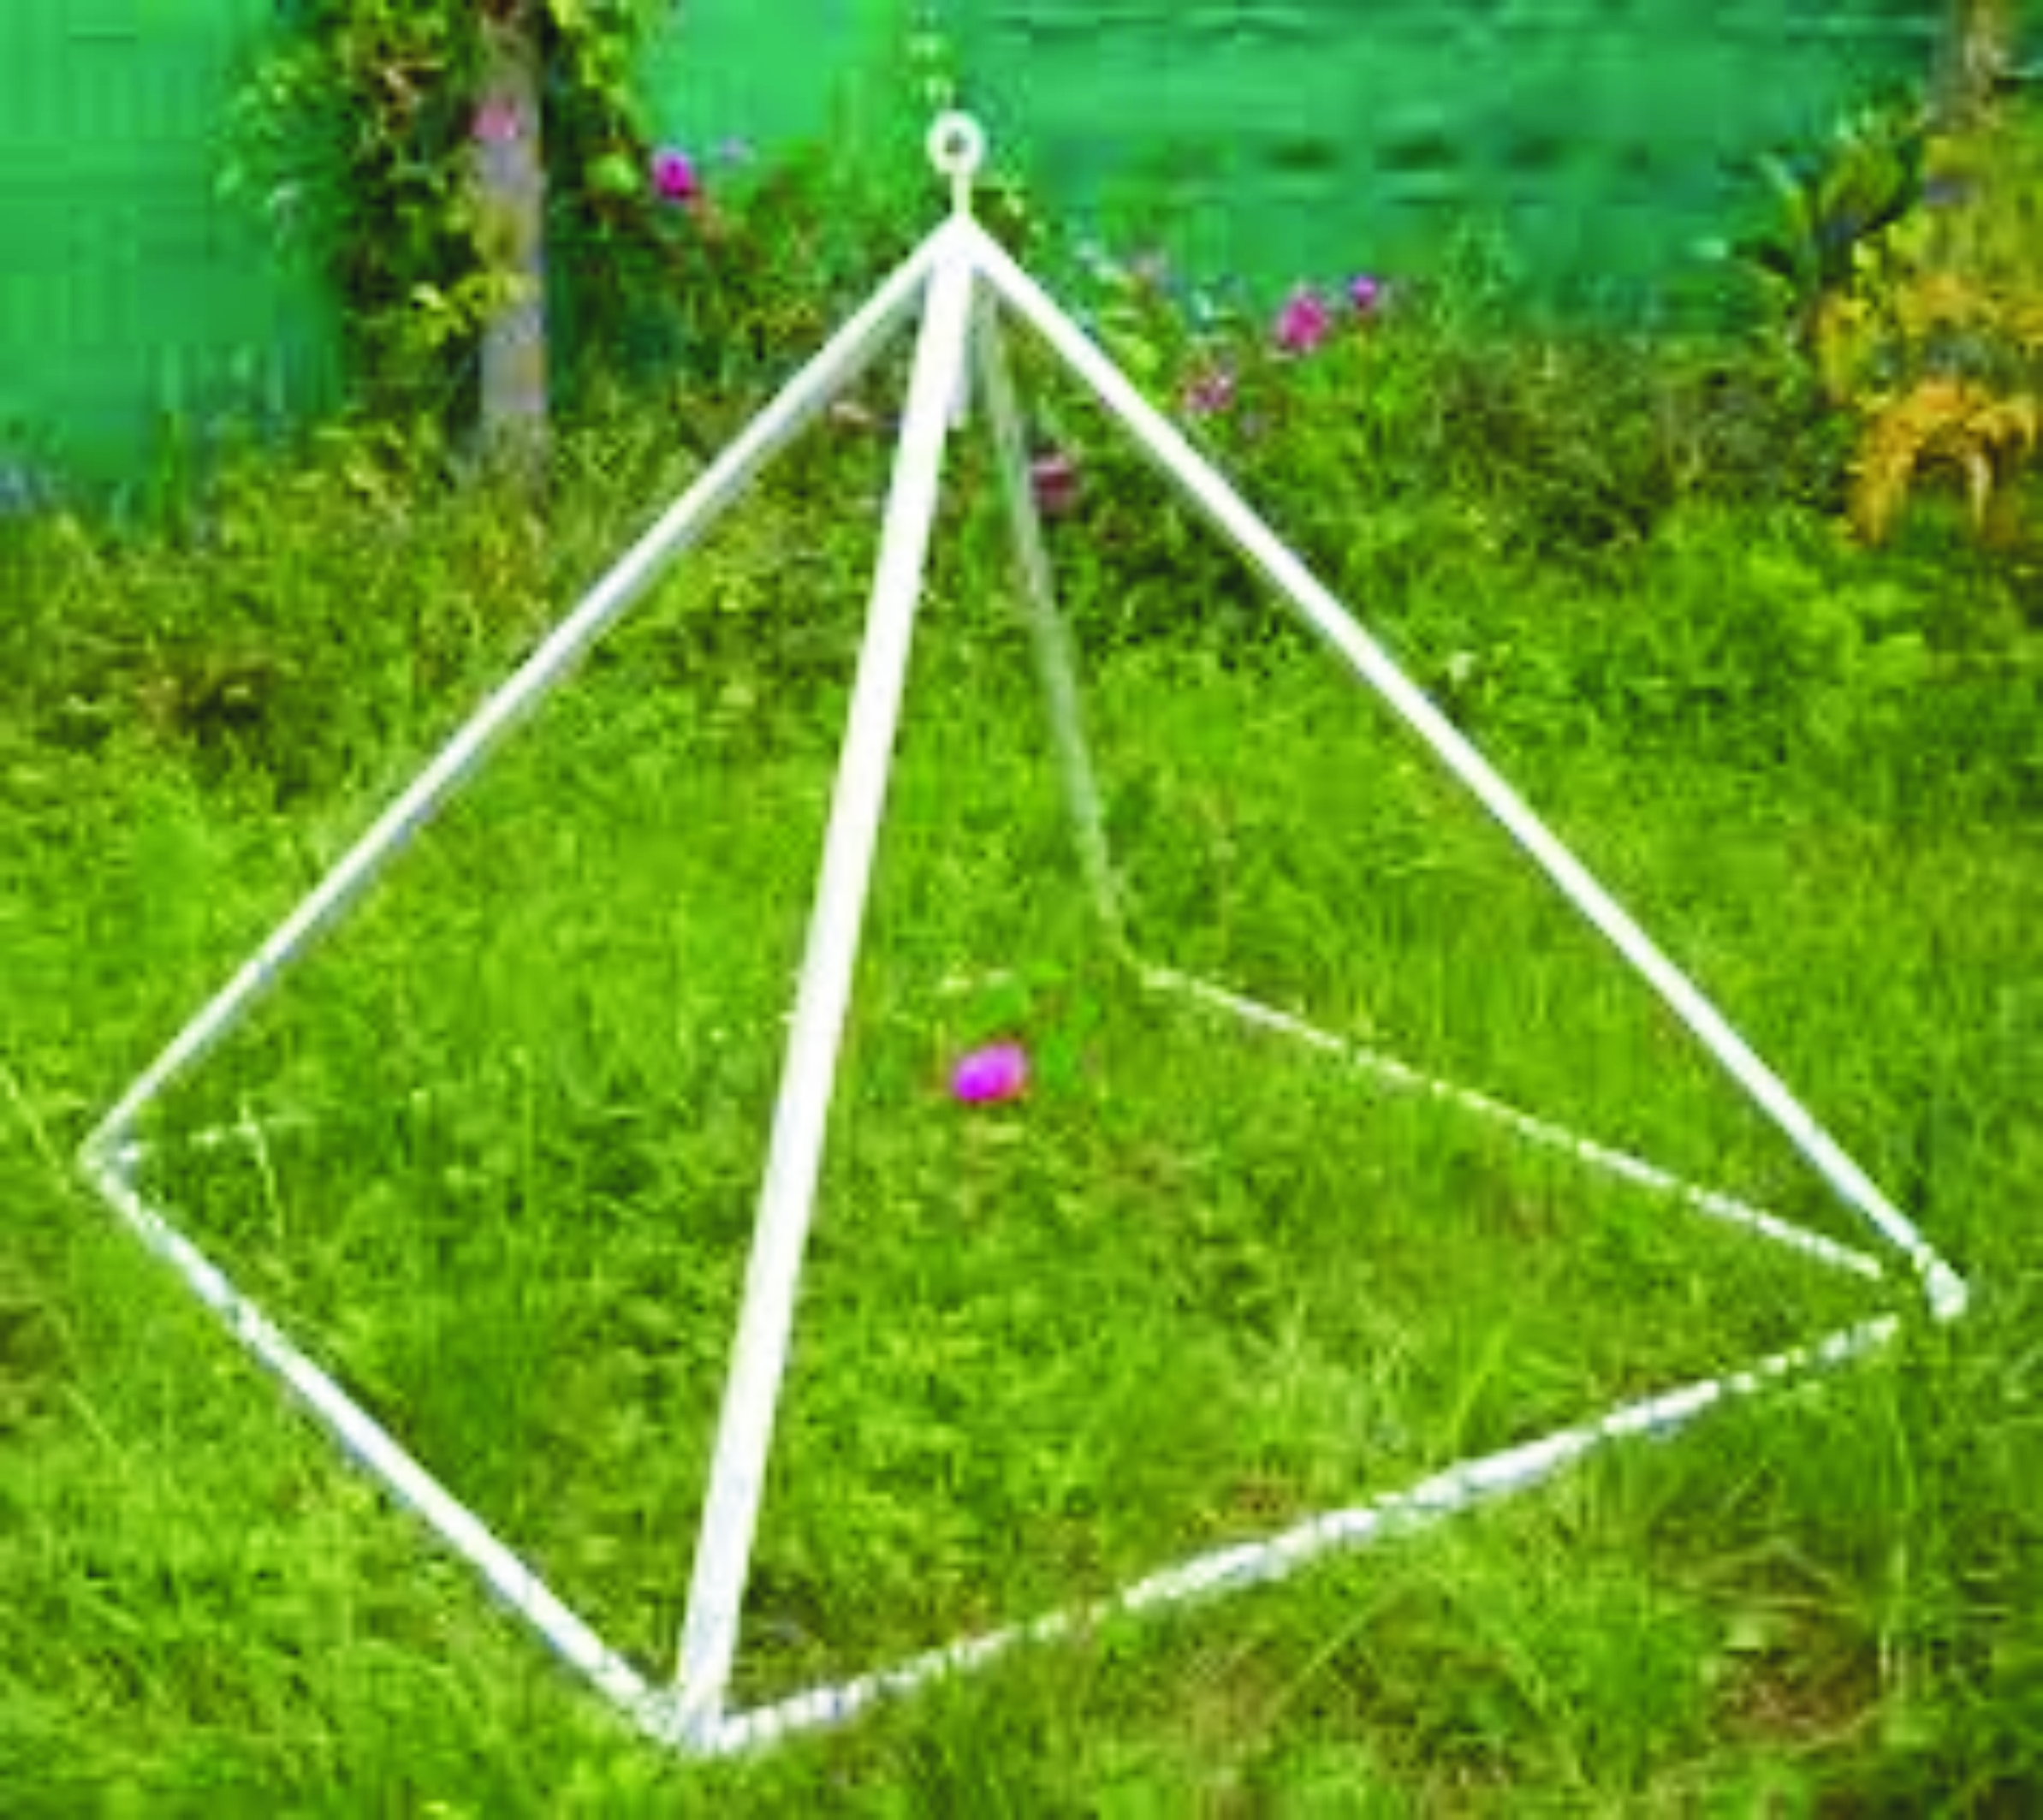 pyramída-externa-náčrty